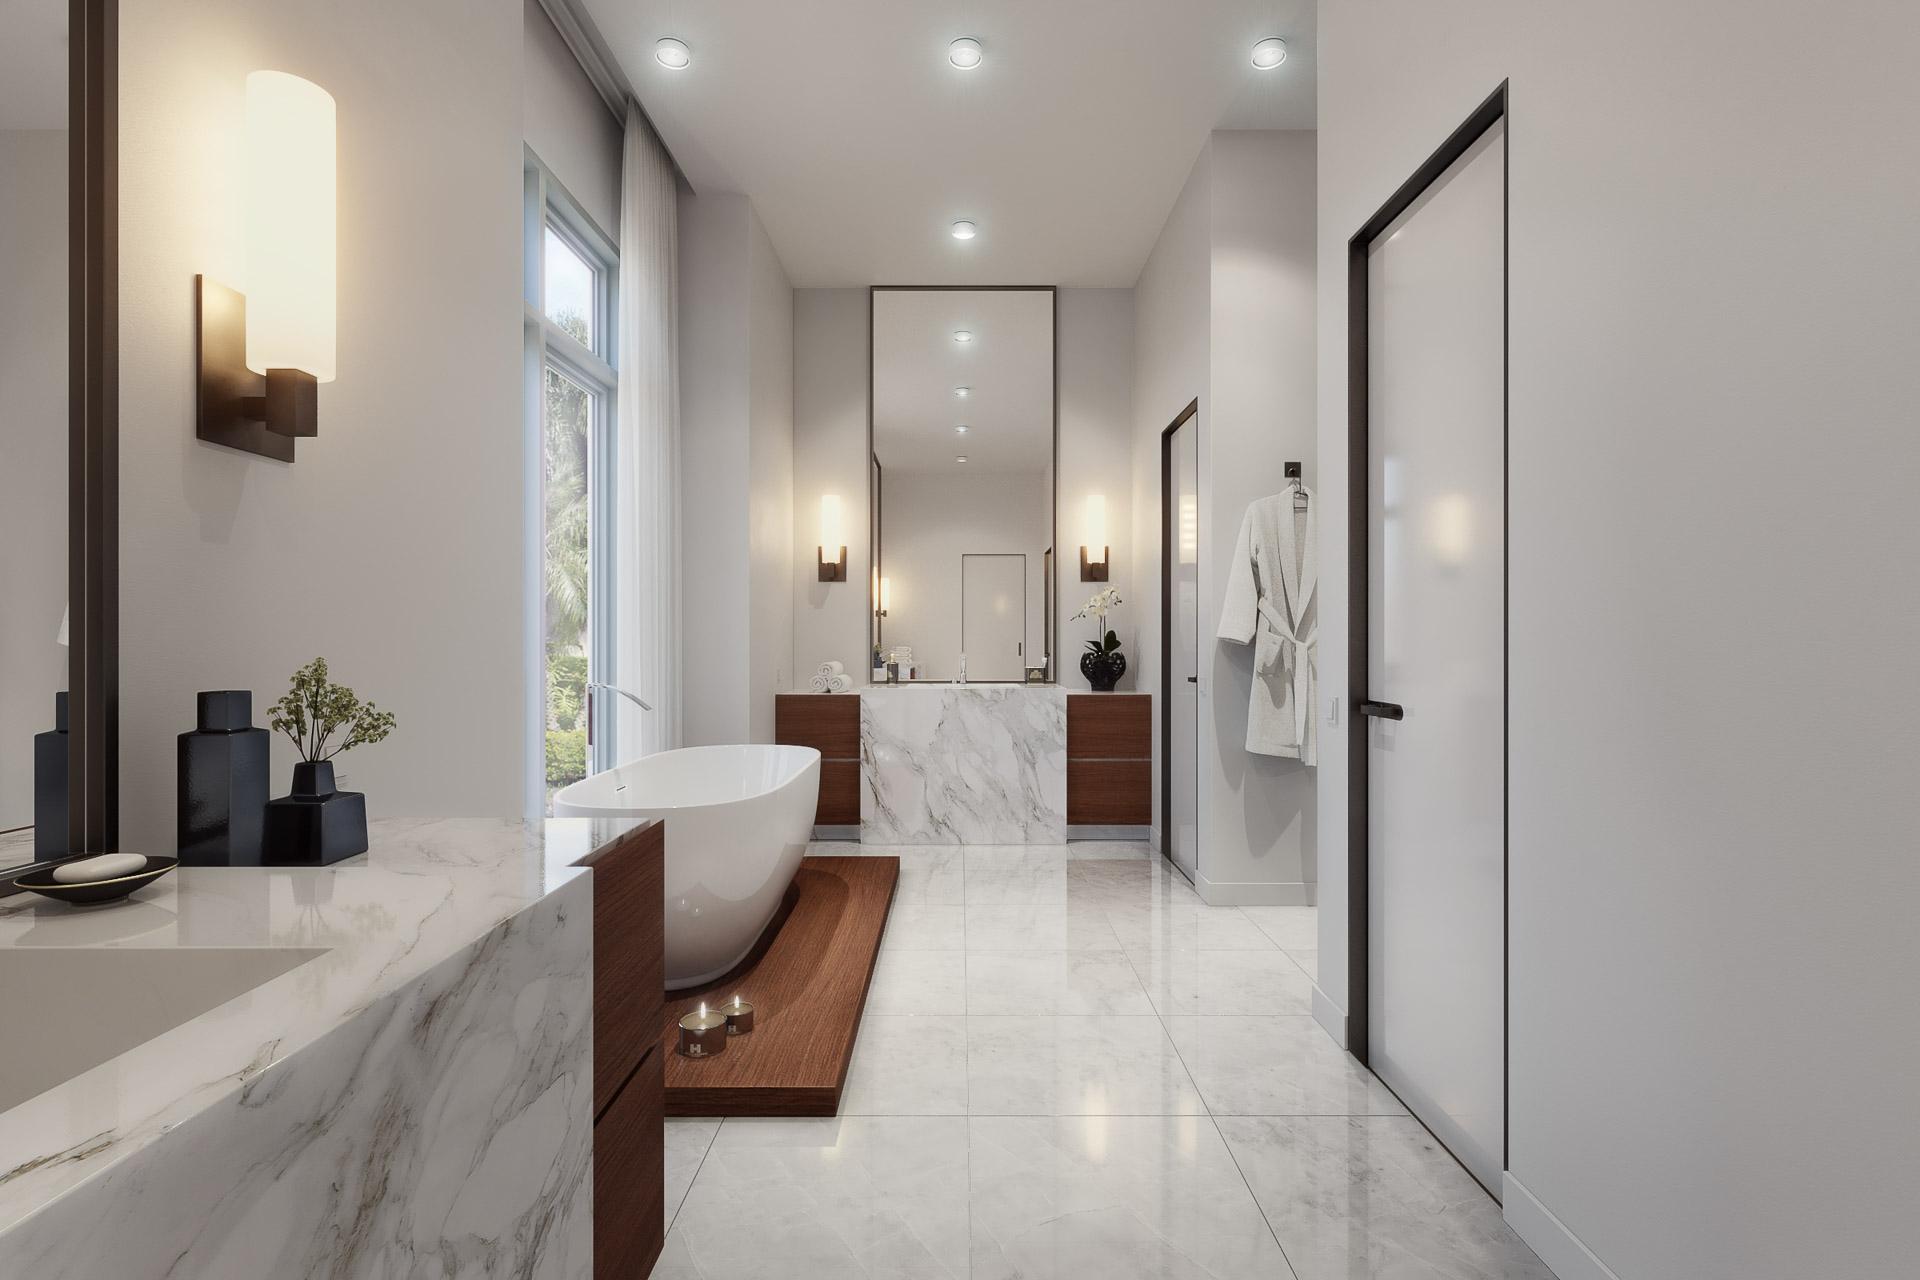 333_Gulf_Shore_Bathroom_020918